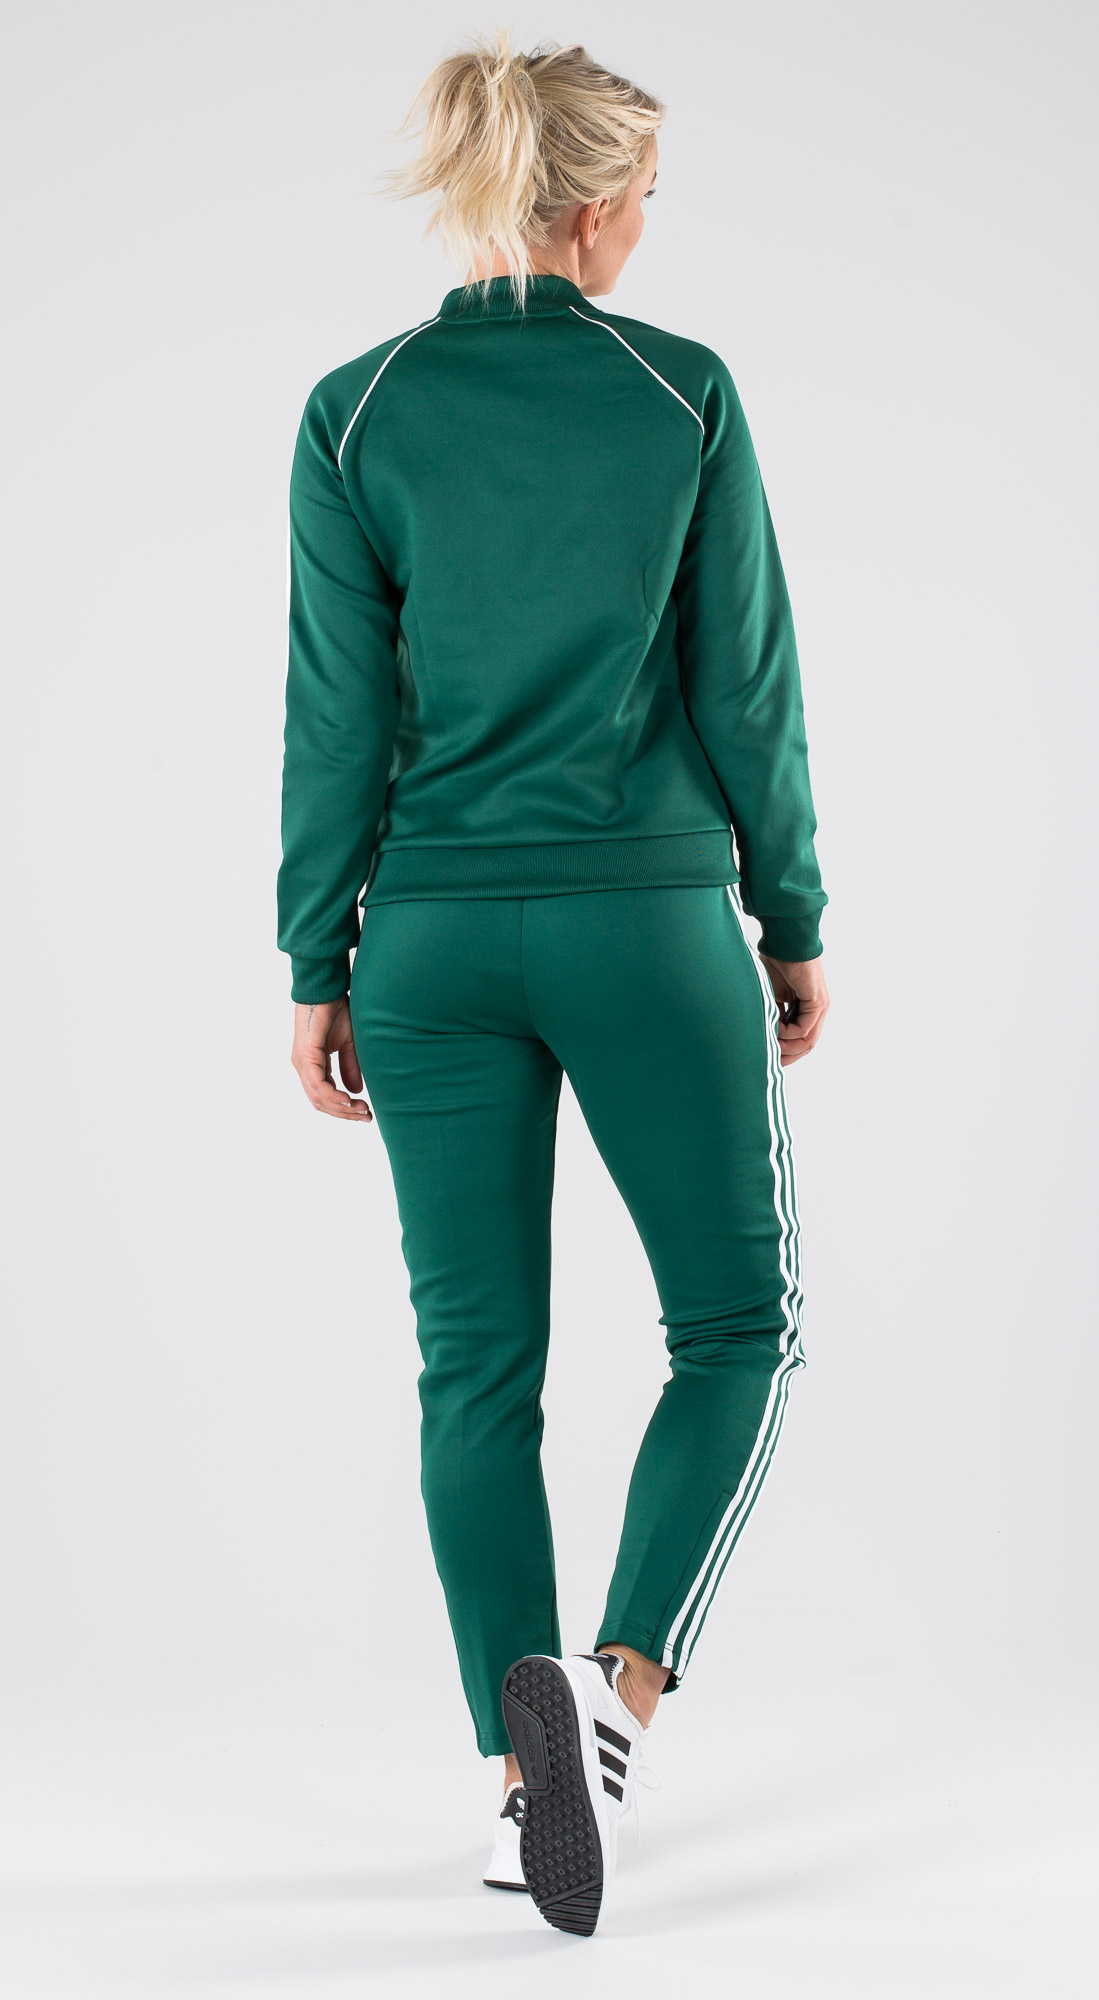 Adidas Originals Sst Tt Collegiate Green Outfit Ridestore